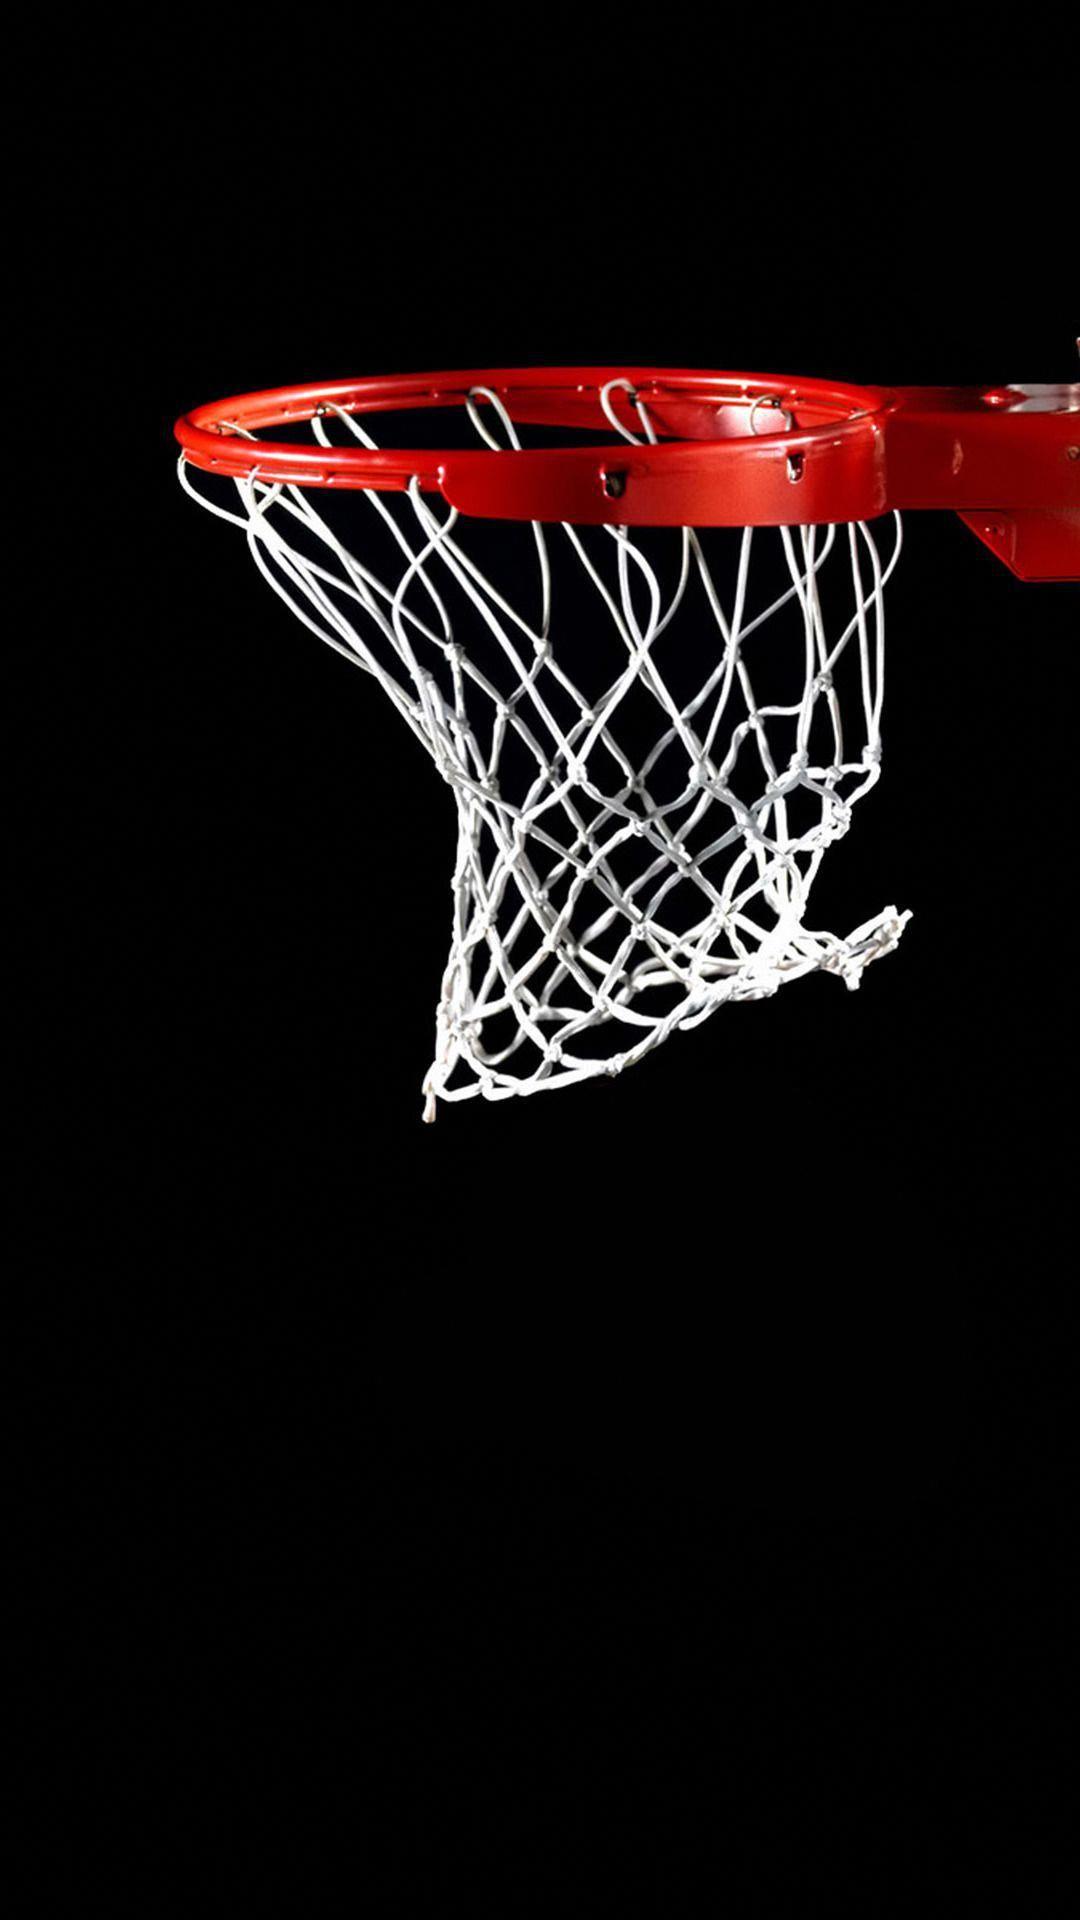 a1f6758592 Shoot Basketball Basketry Dark Background  iPhone  6  plus  wallpaper   basketballnets